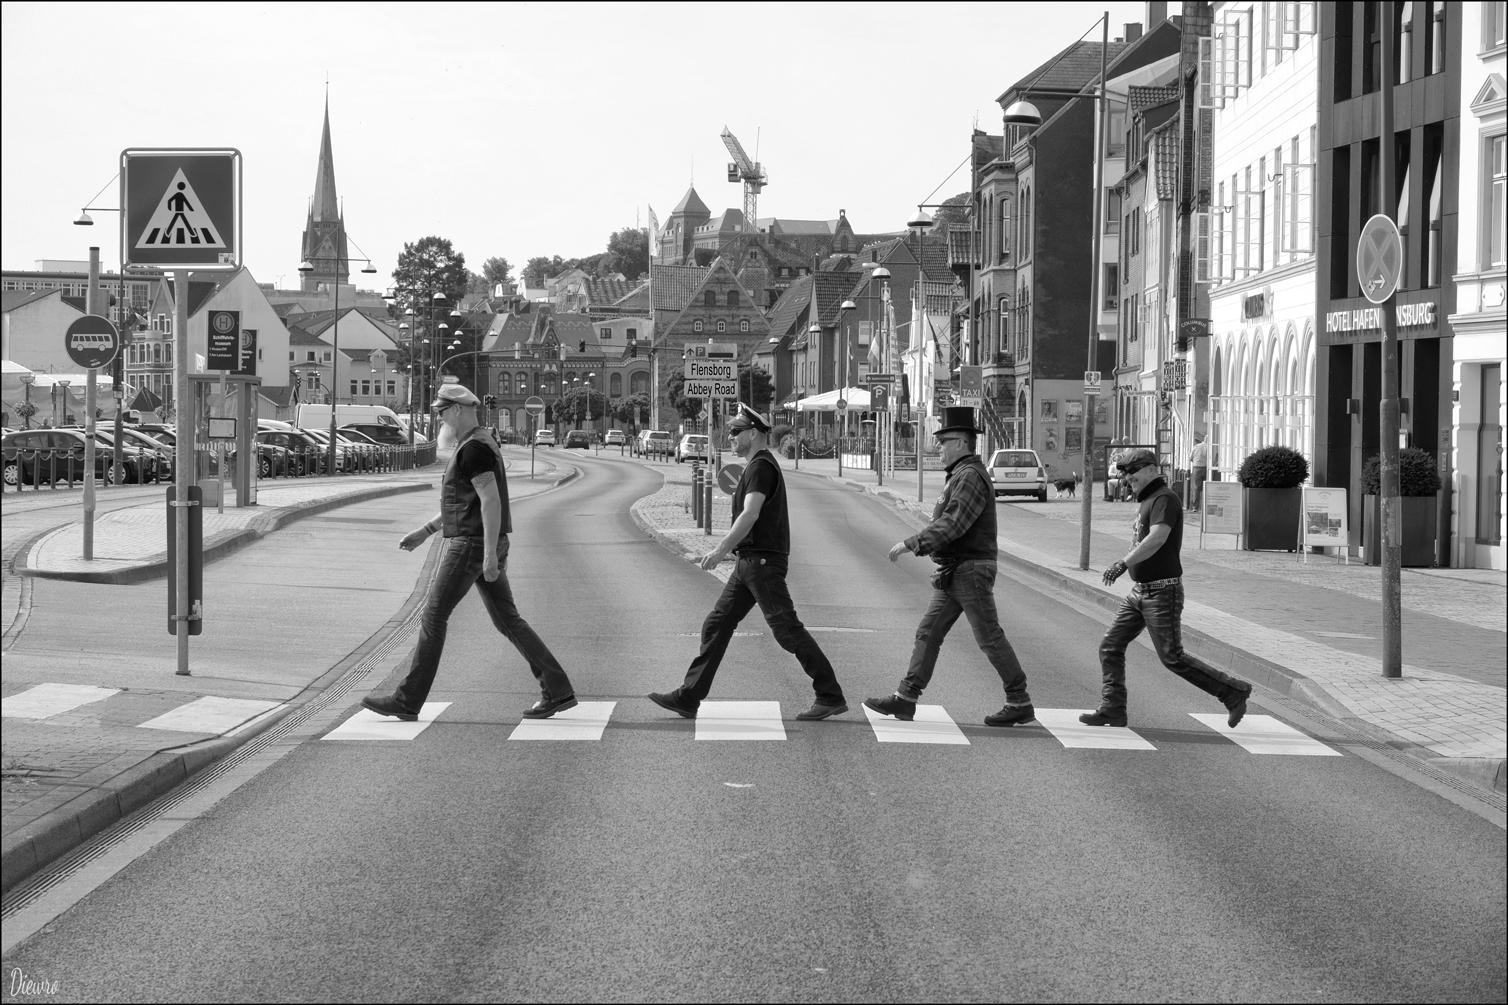 Flensborg Abbey Road